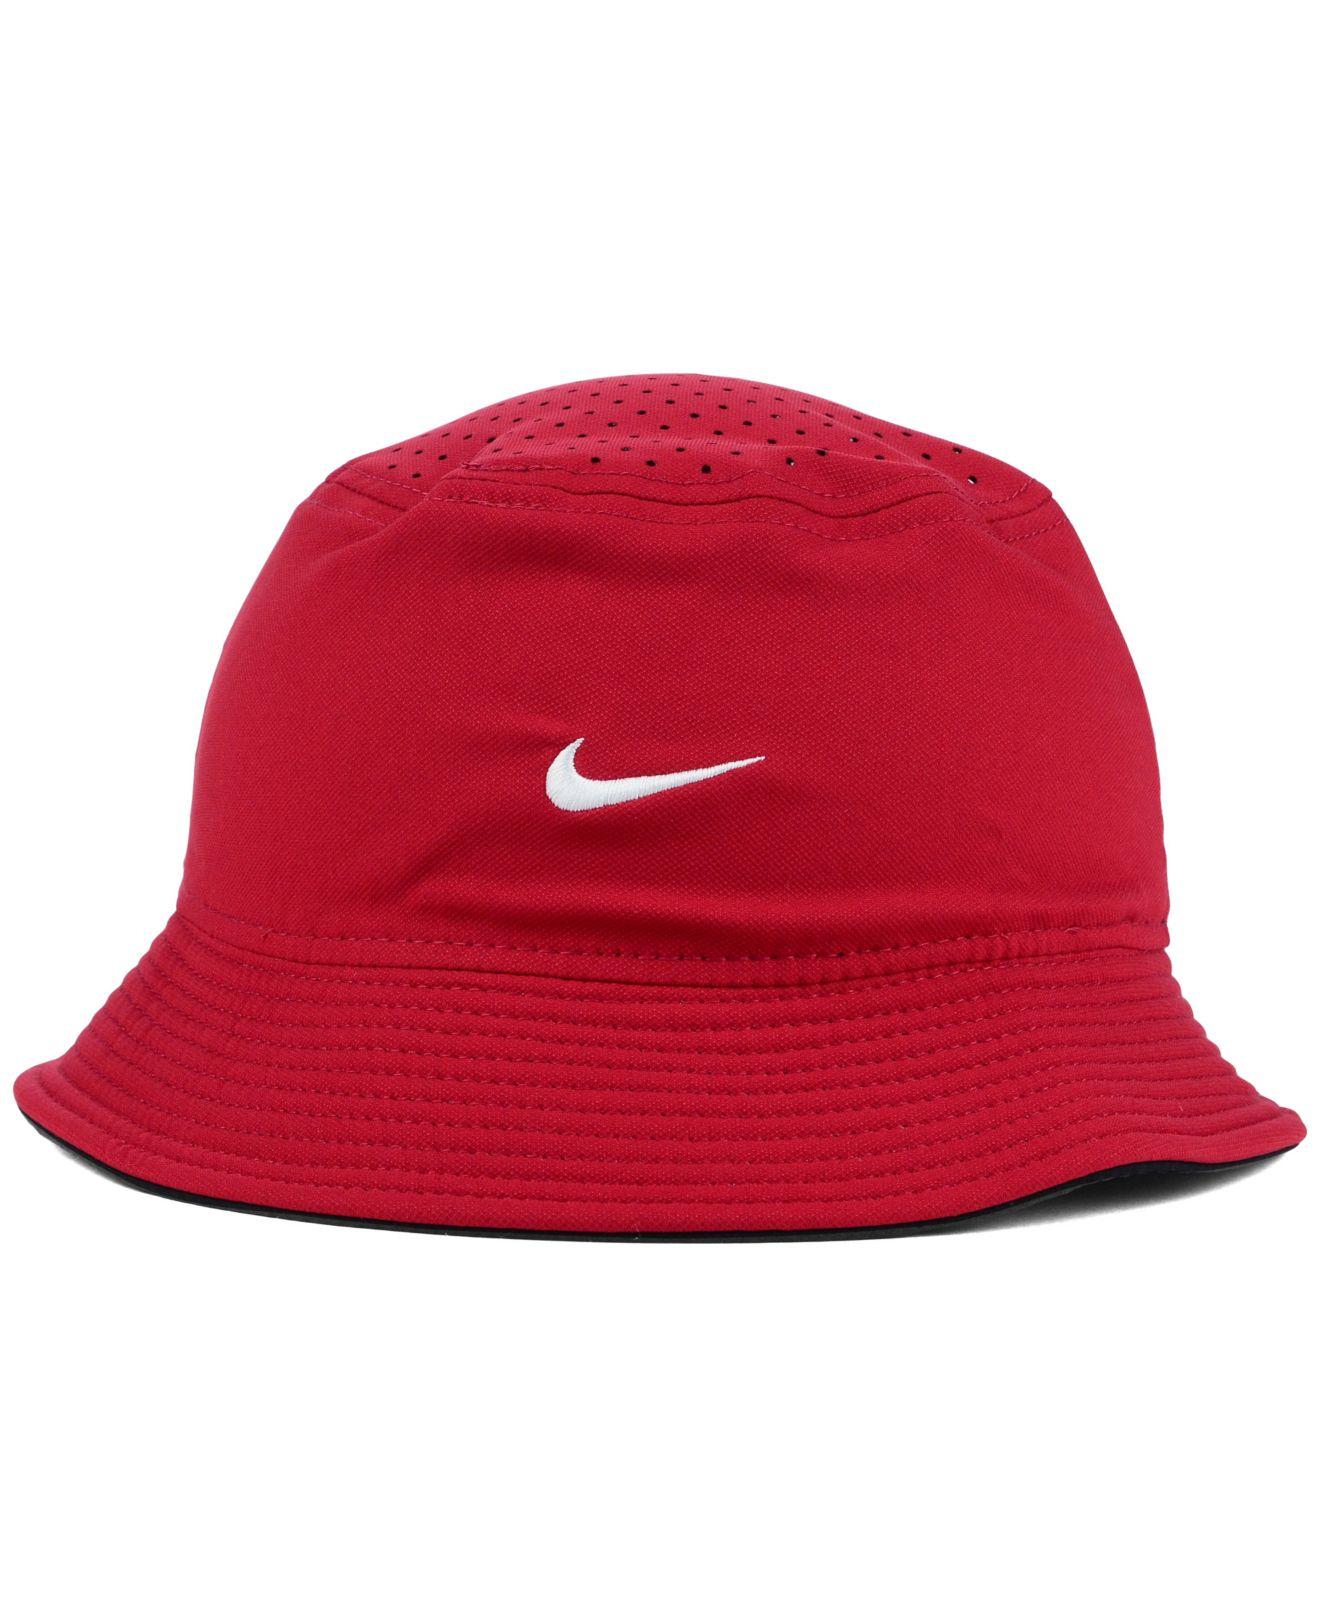 766a5bef227de ... closeout lyst nike alabama crimson tide vapor bucket hat in purple for  men 3de2b a85f4